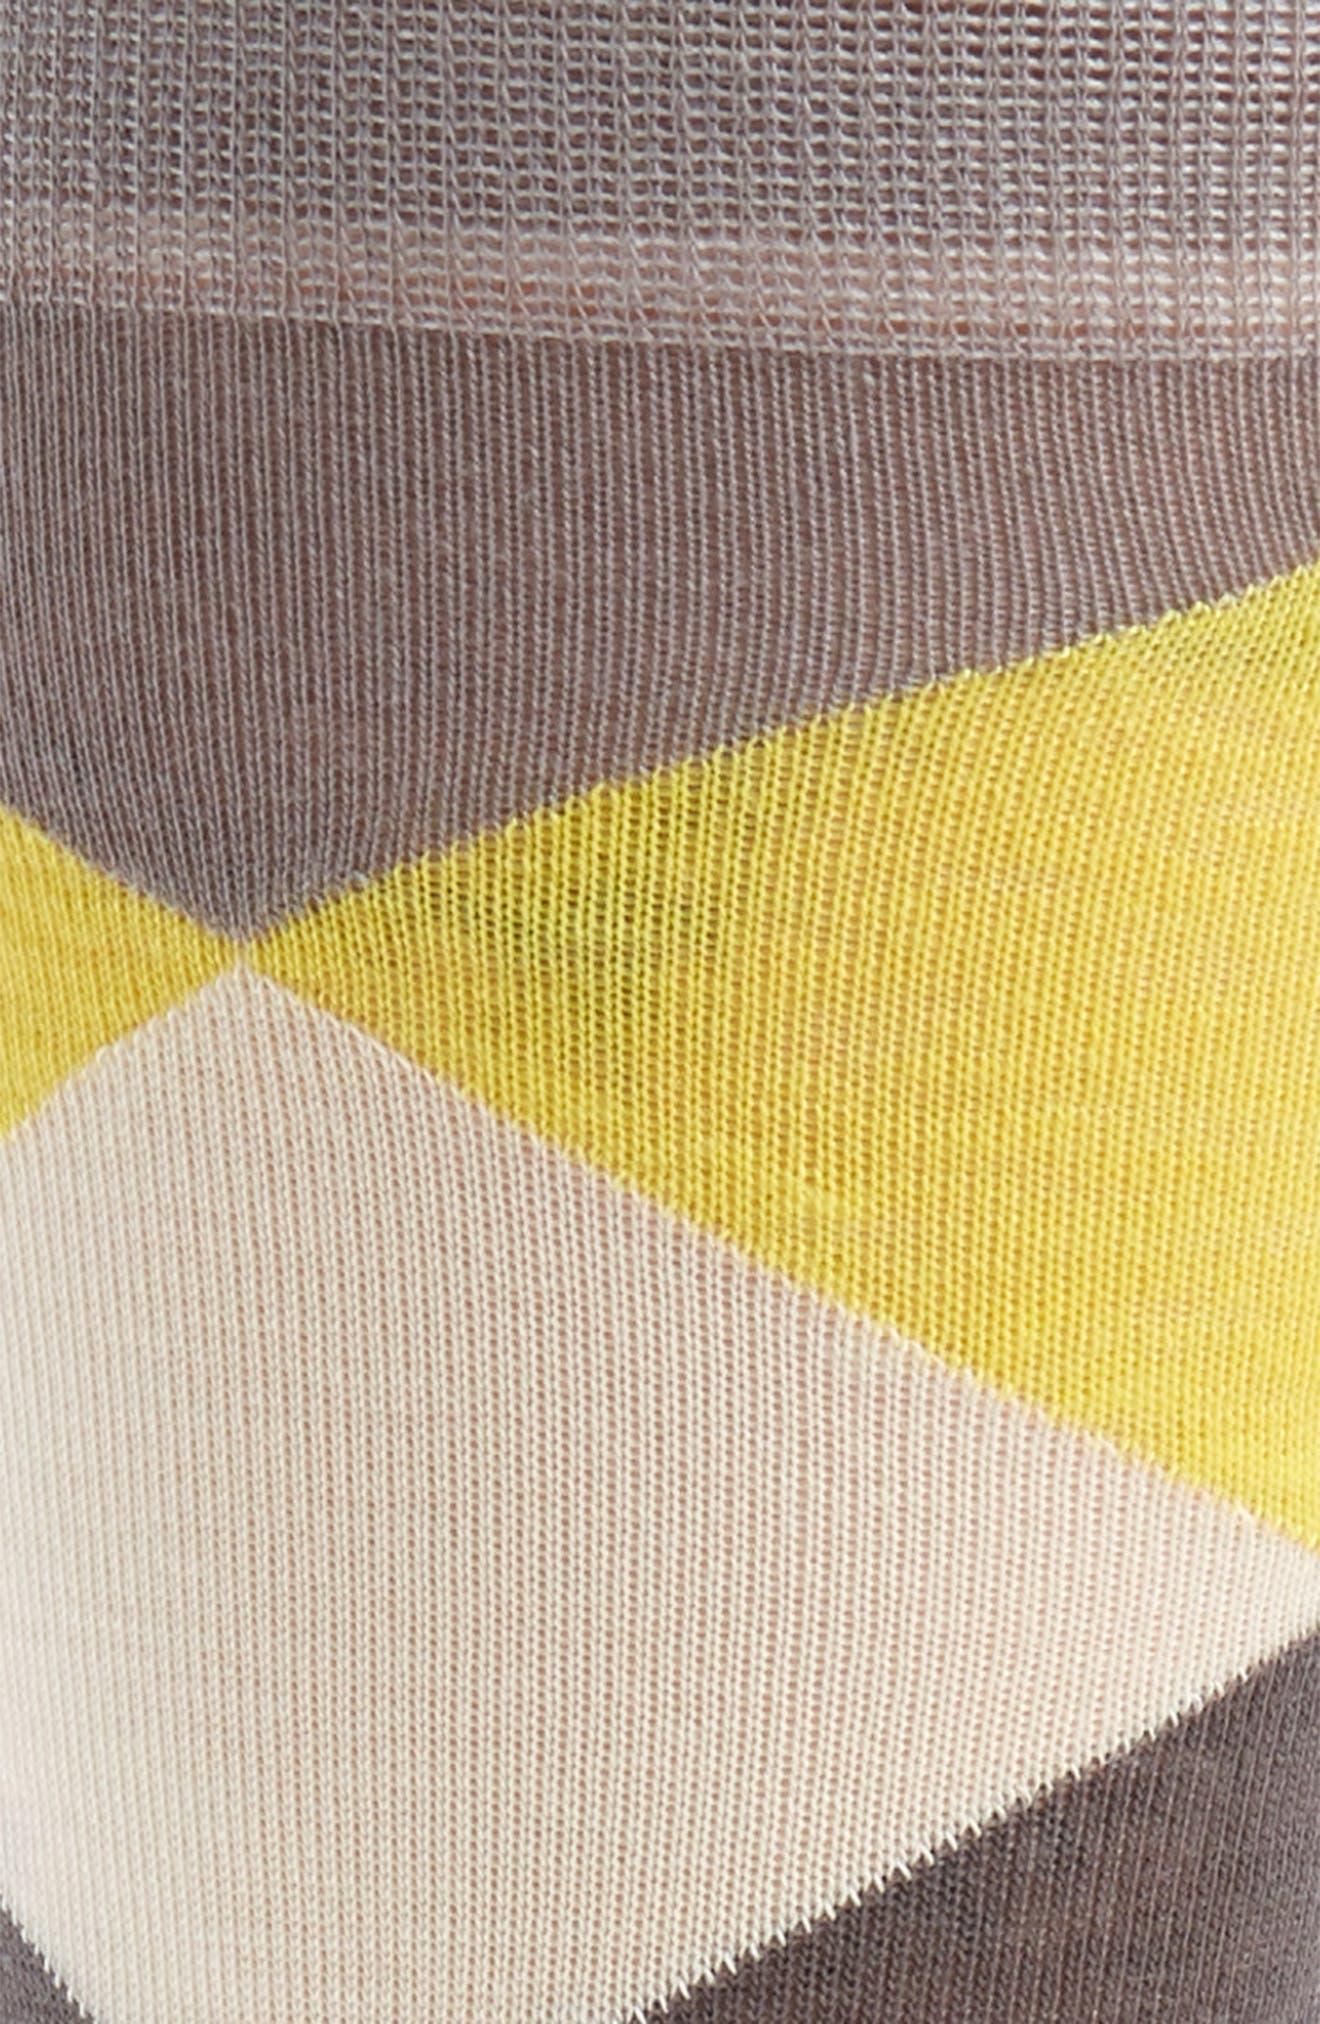 Large Diamond Crew Socks,                             Alternate thumbnail 2, color,                             030